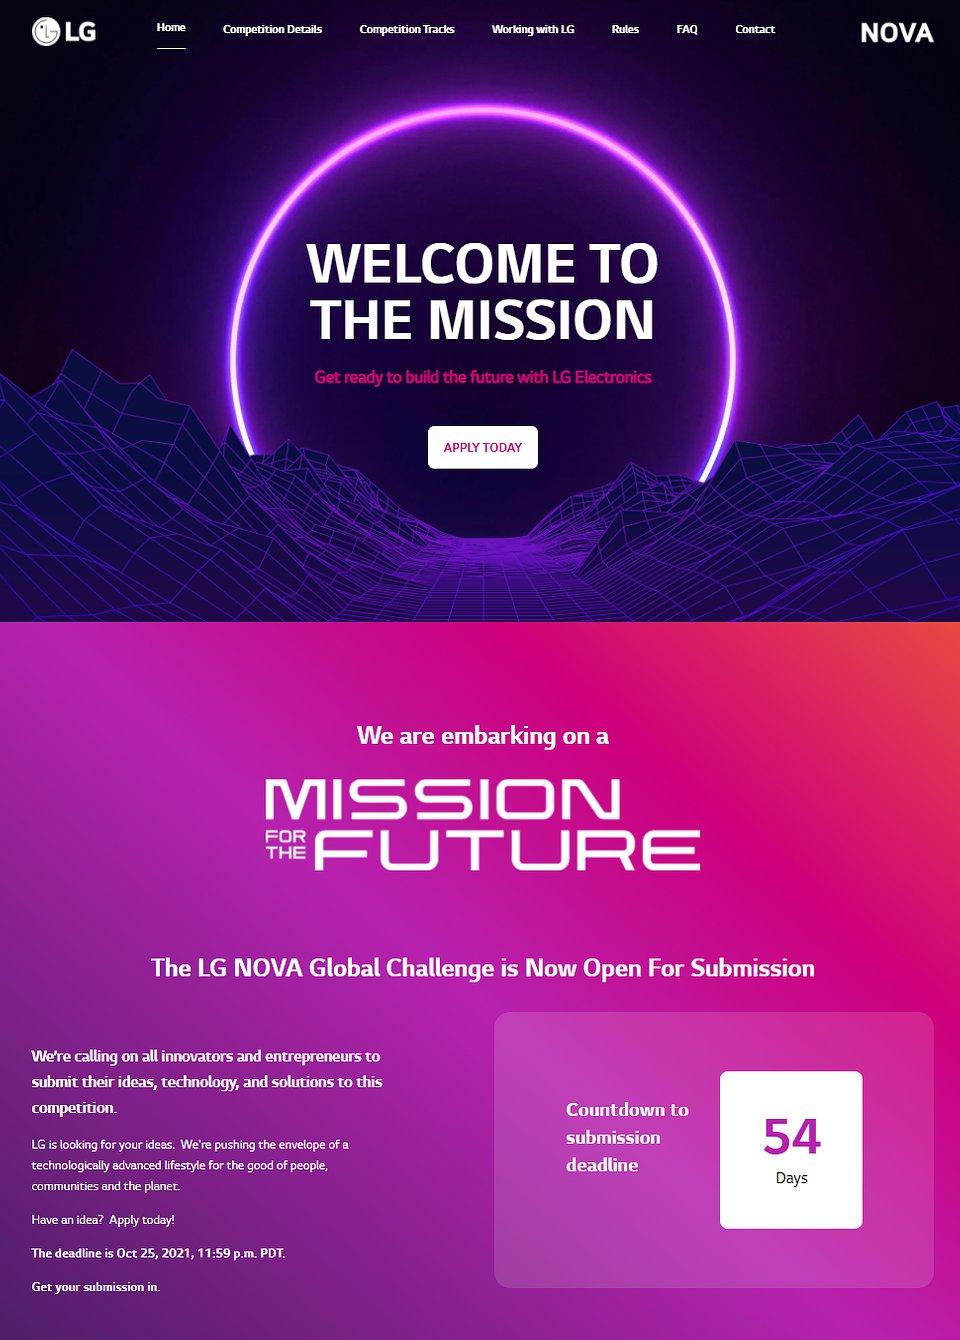 LG NOVA Mission for the Future 01 UPDATED.jpg